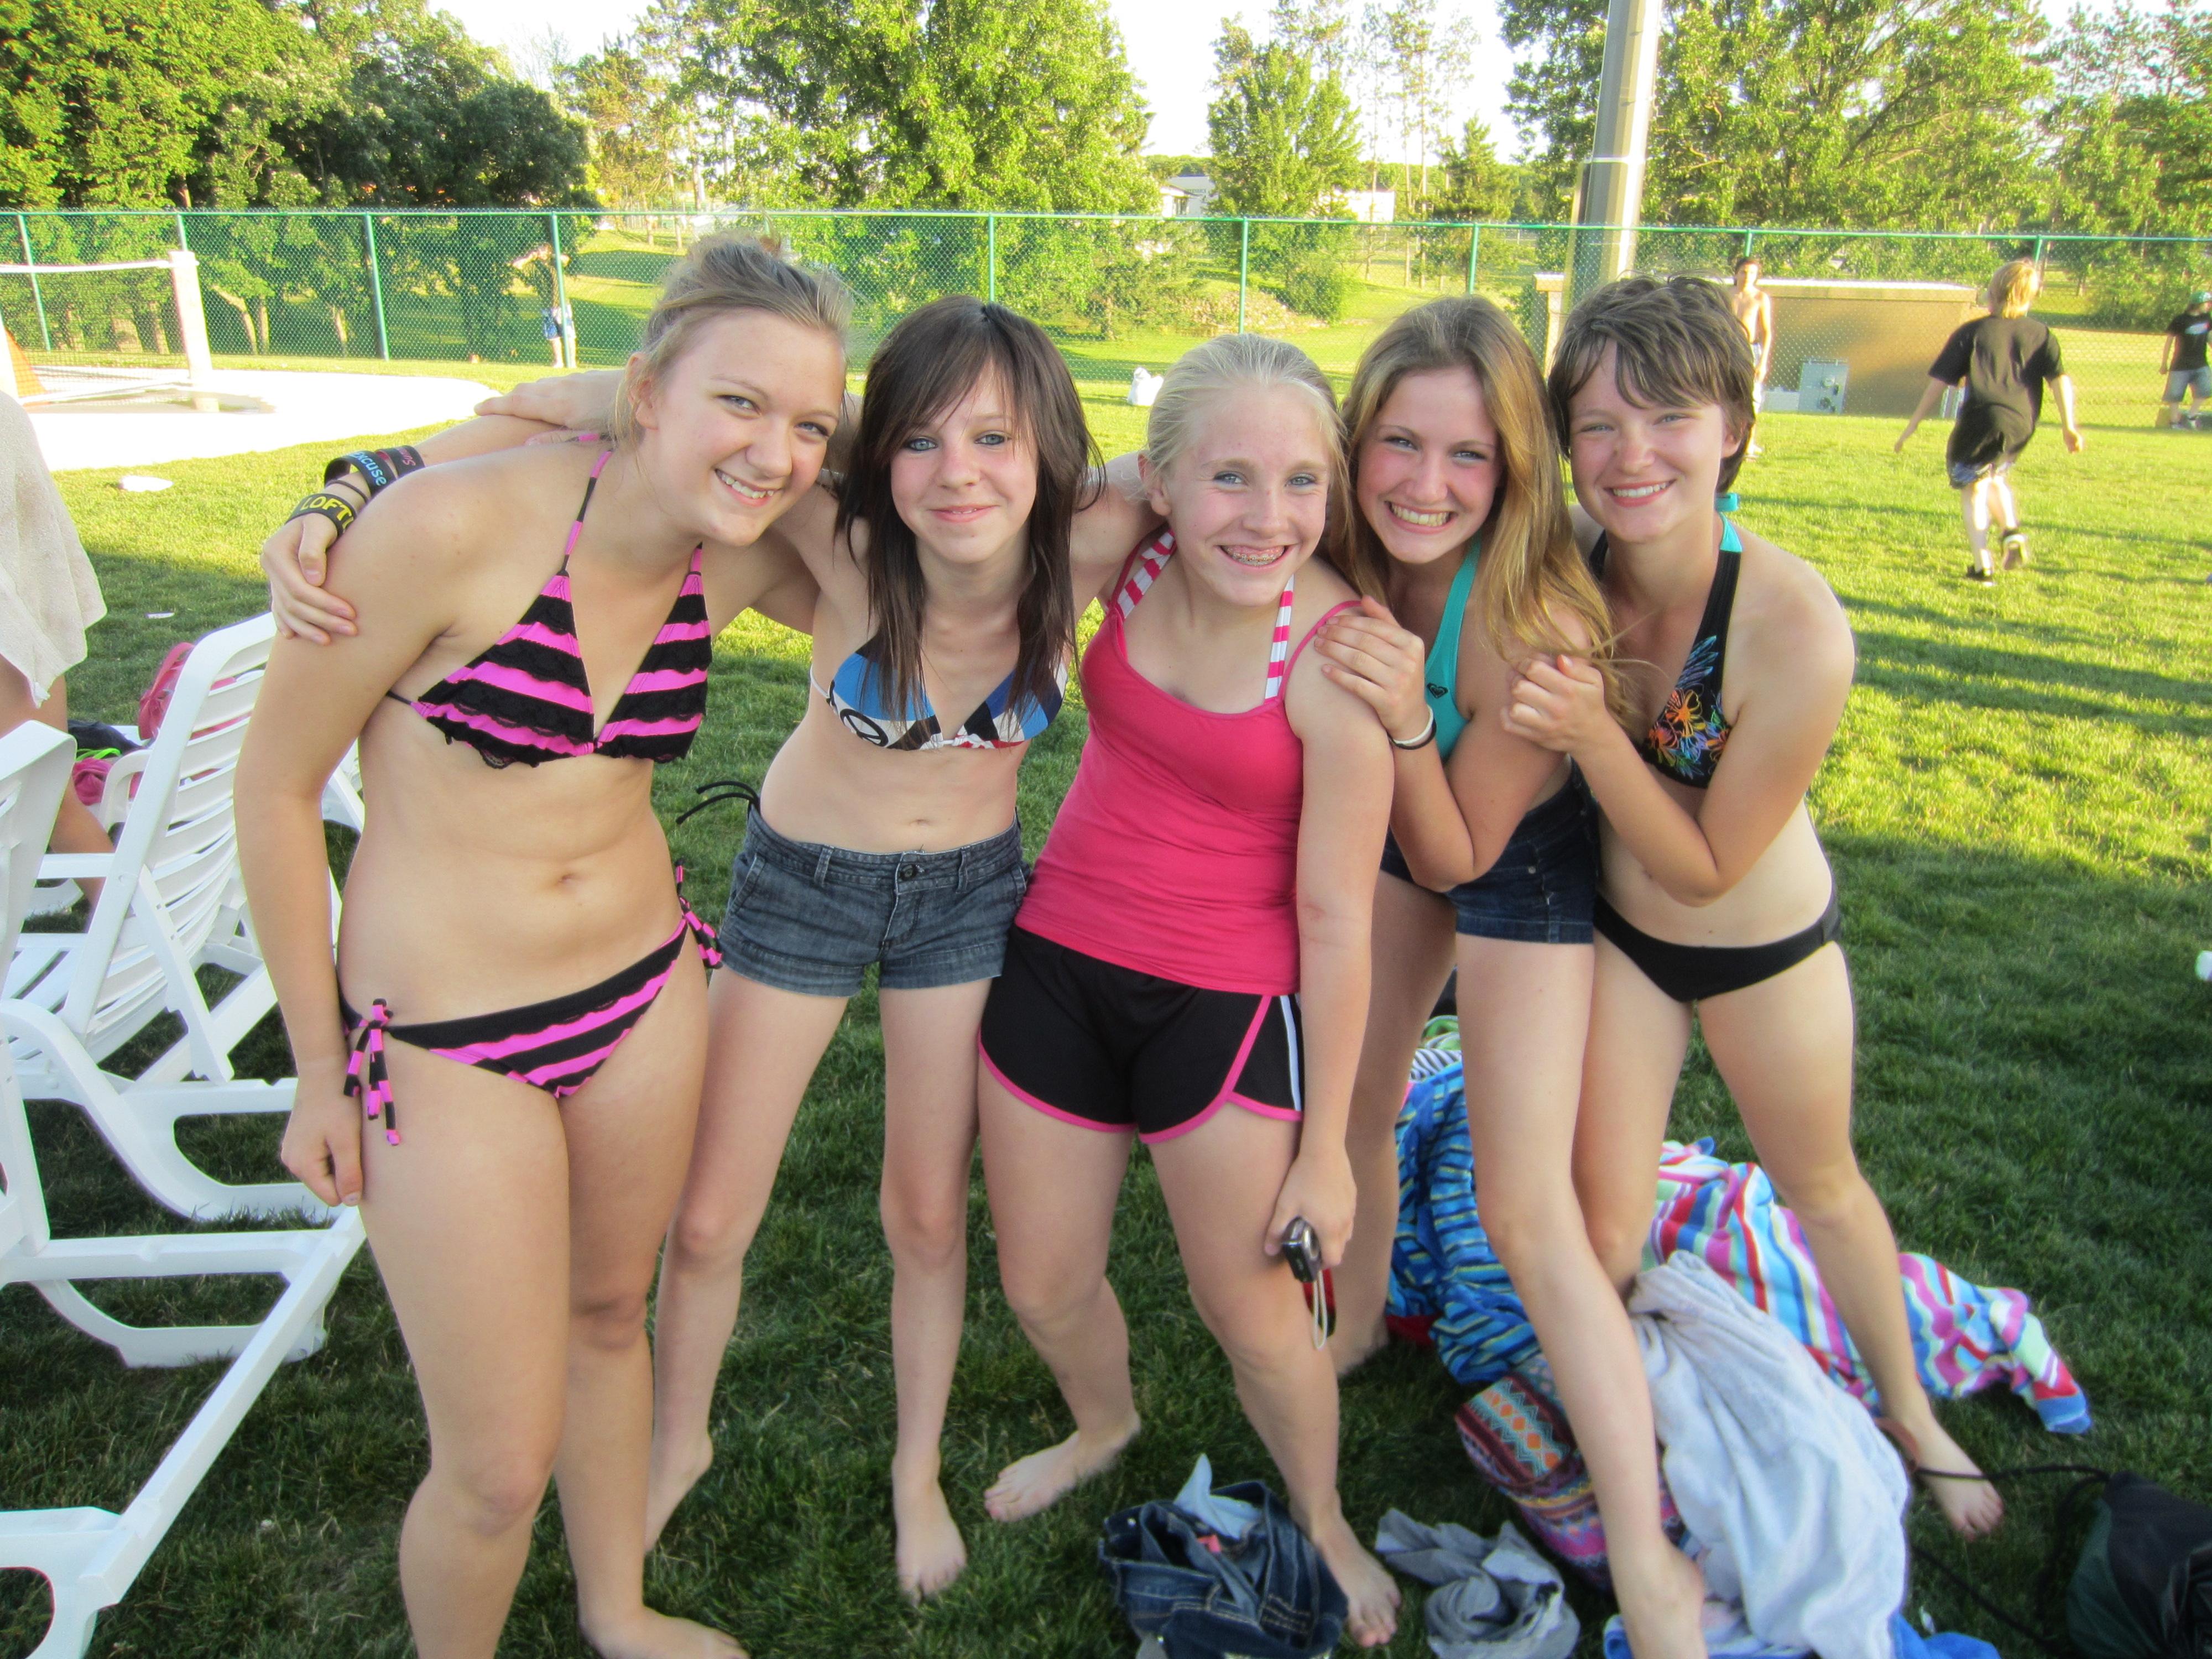 candid waterpark girls